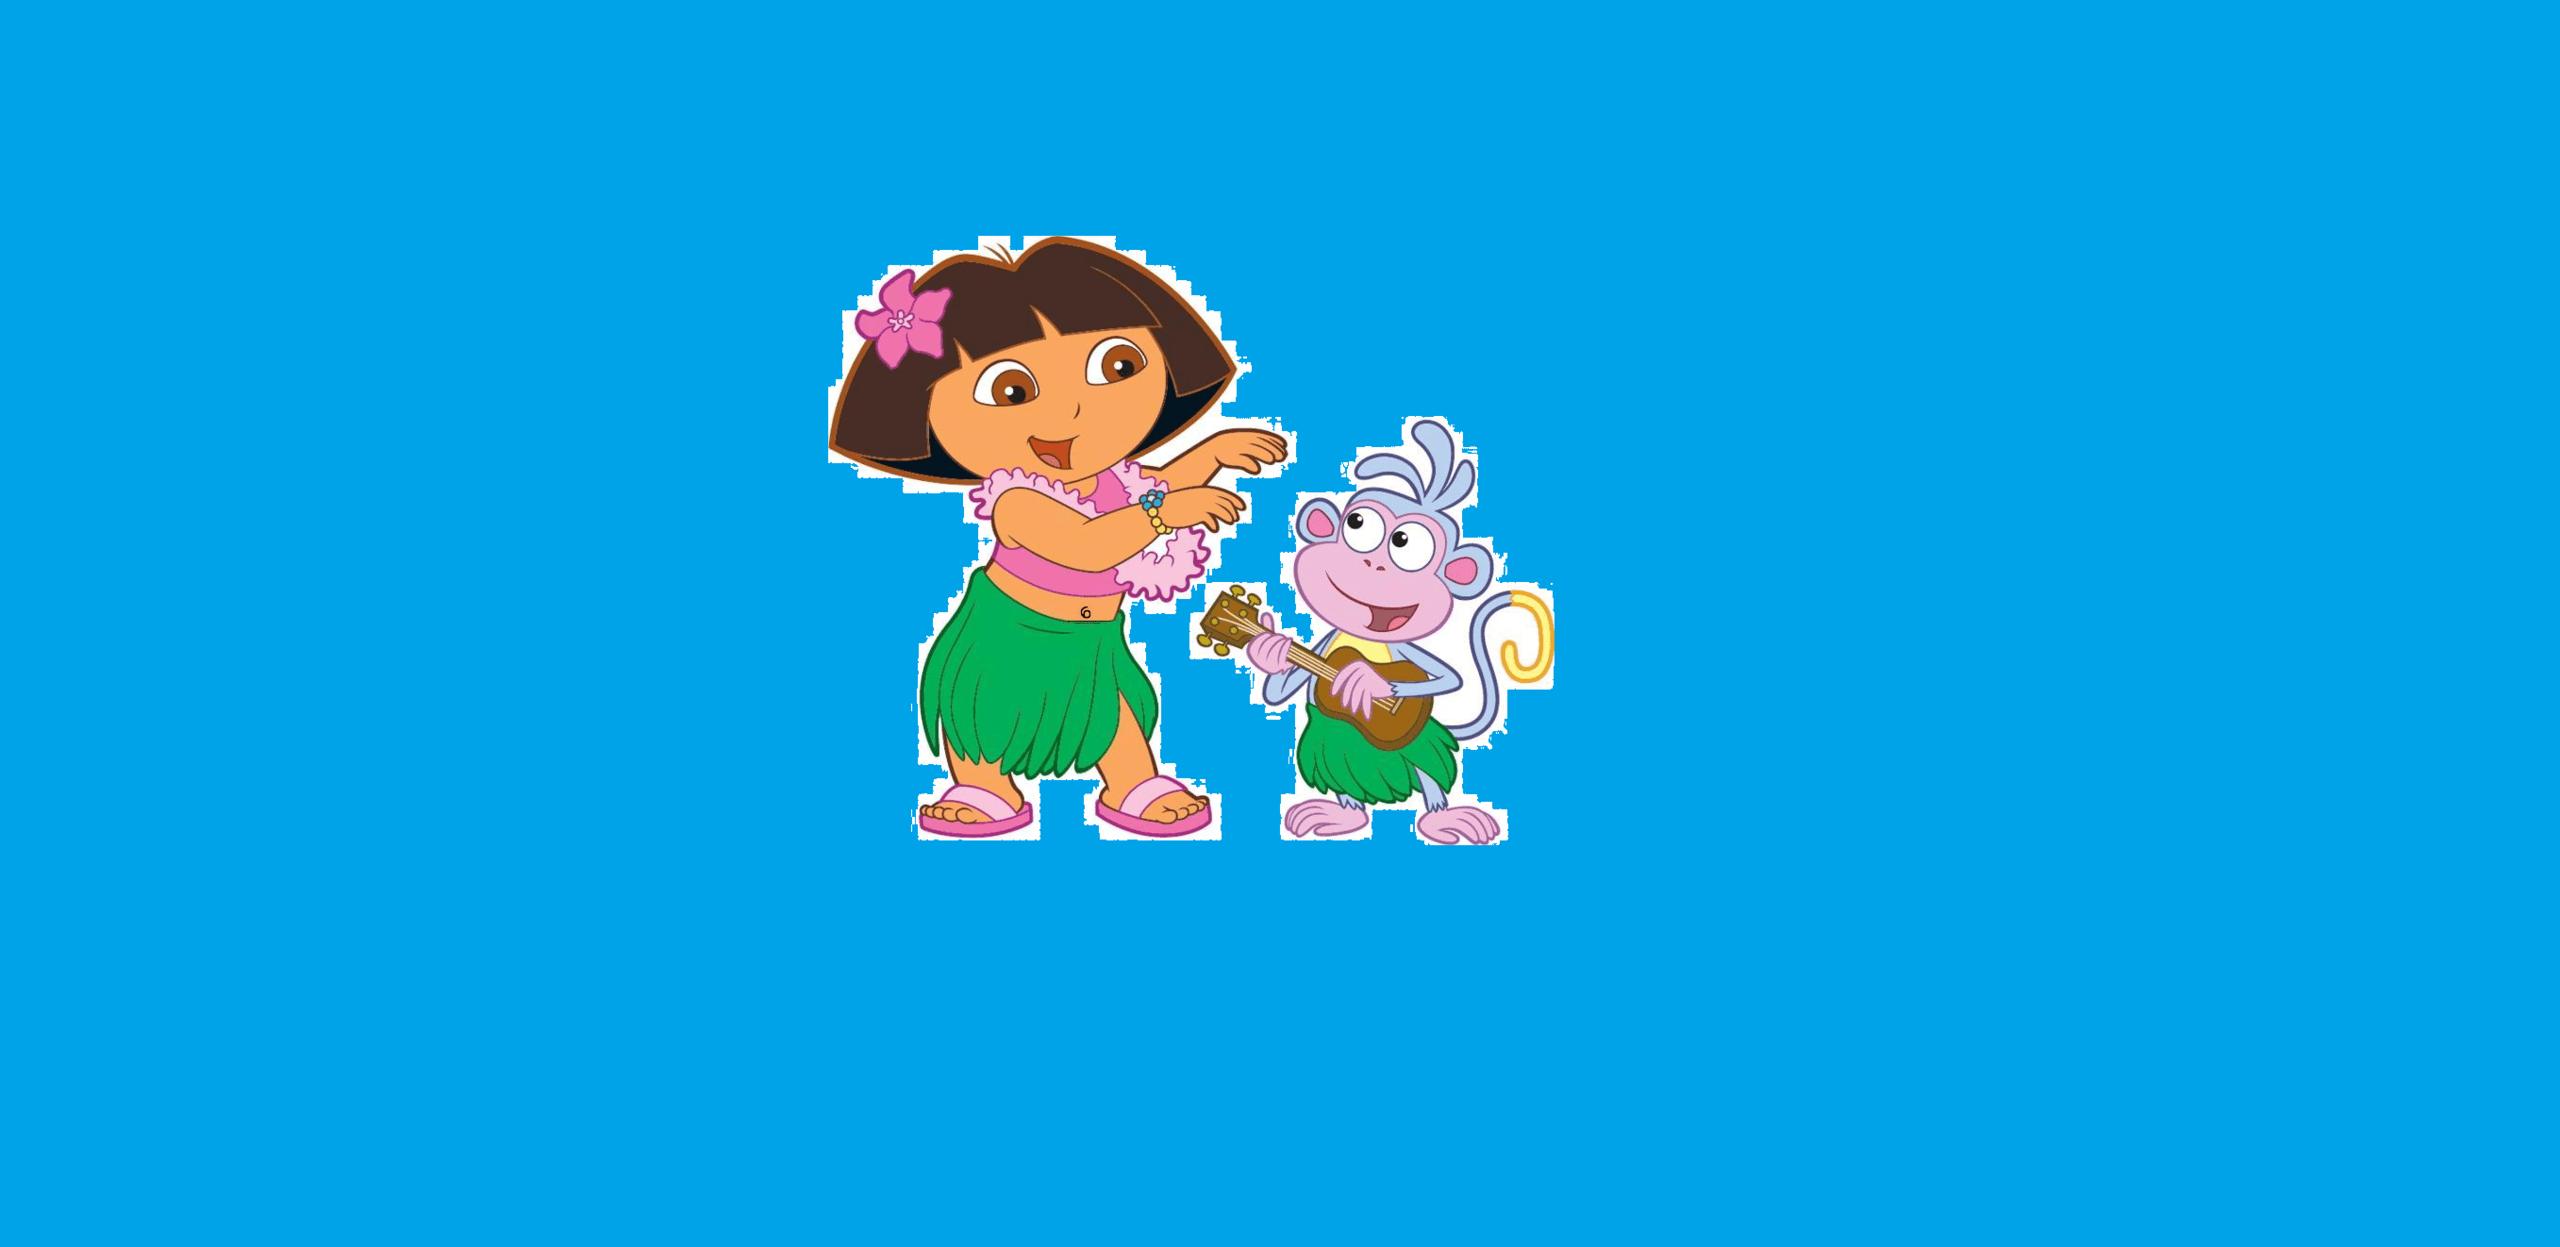 Cute Pony Wallpaper Dora Backgrounds Download Pixelstalk Net